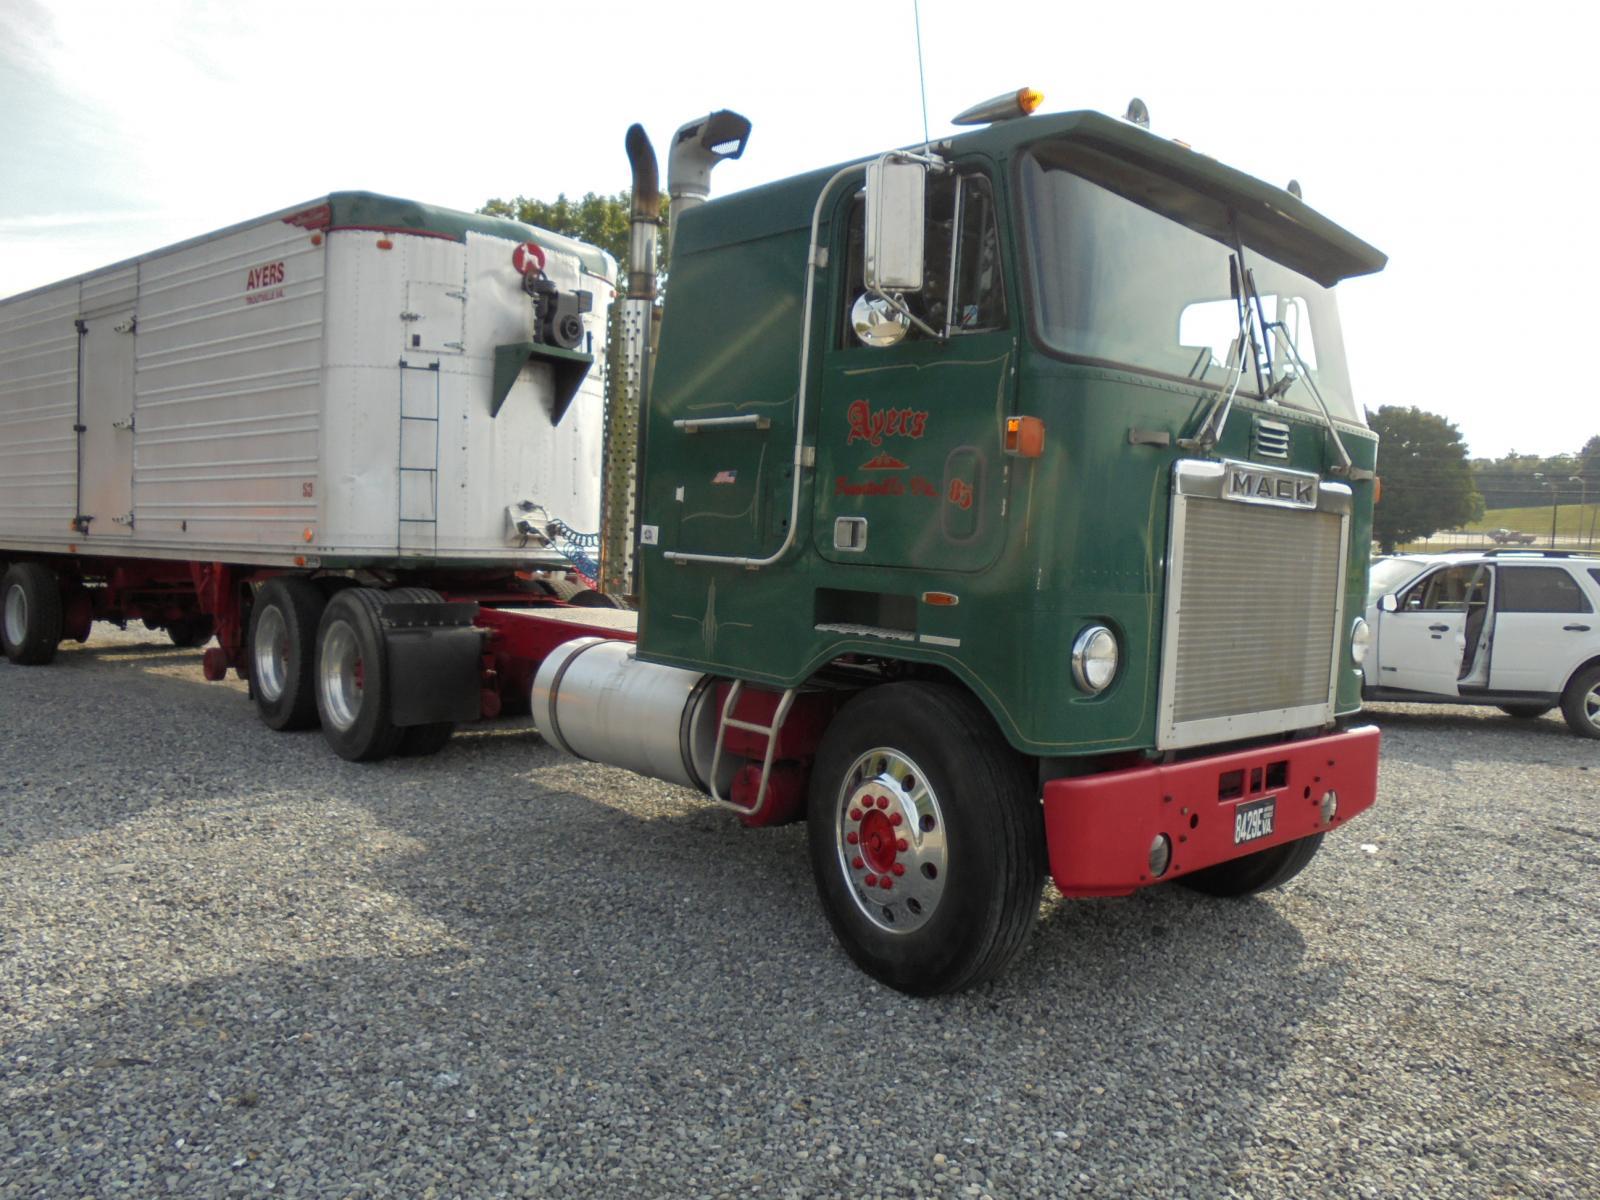 Trucks For Sale In Va >> mack cruiseliner - Trucks for Sale - BigMackTrucks.com